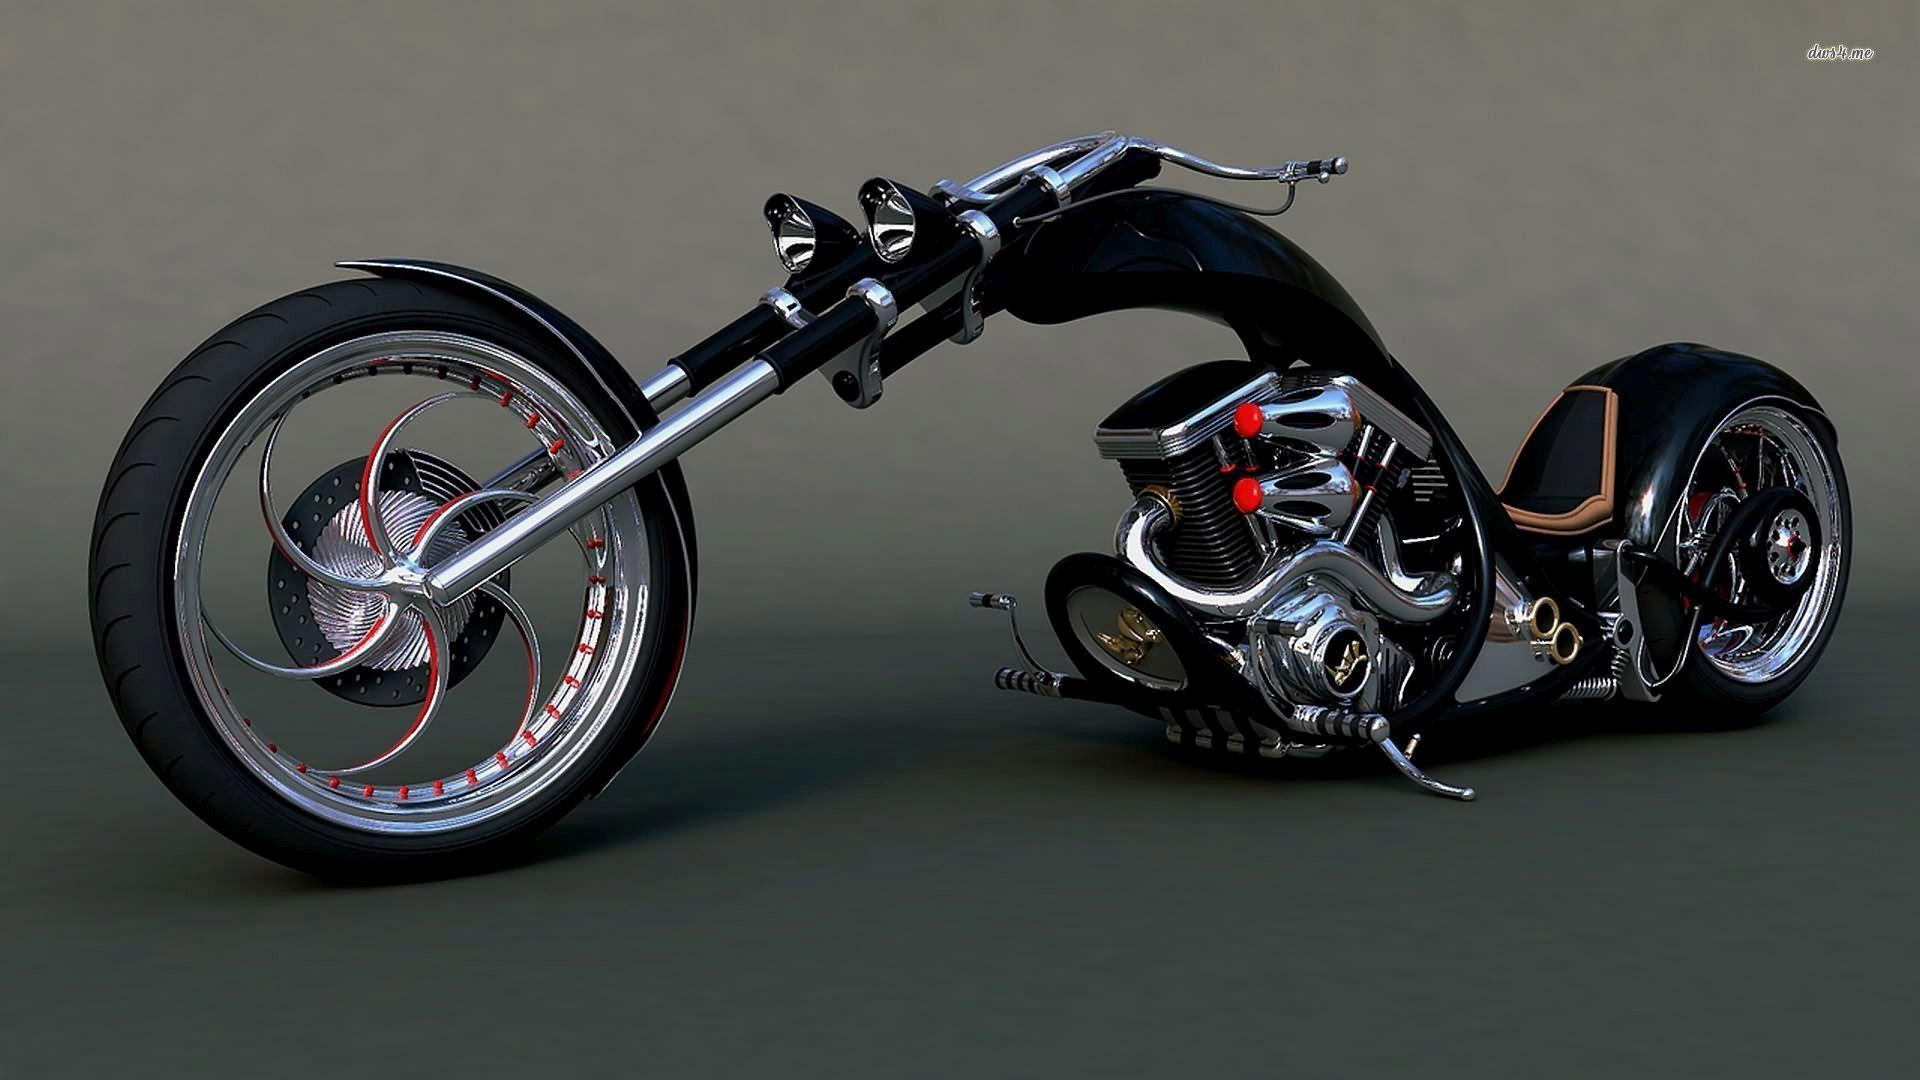 29046-harley-chopper-1920×1080-motorcycle-wallpaper-orange-county-choppers-39572726-1920-1080